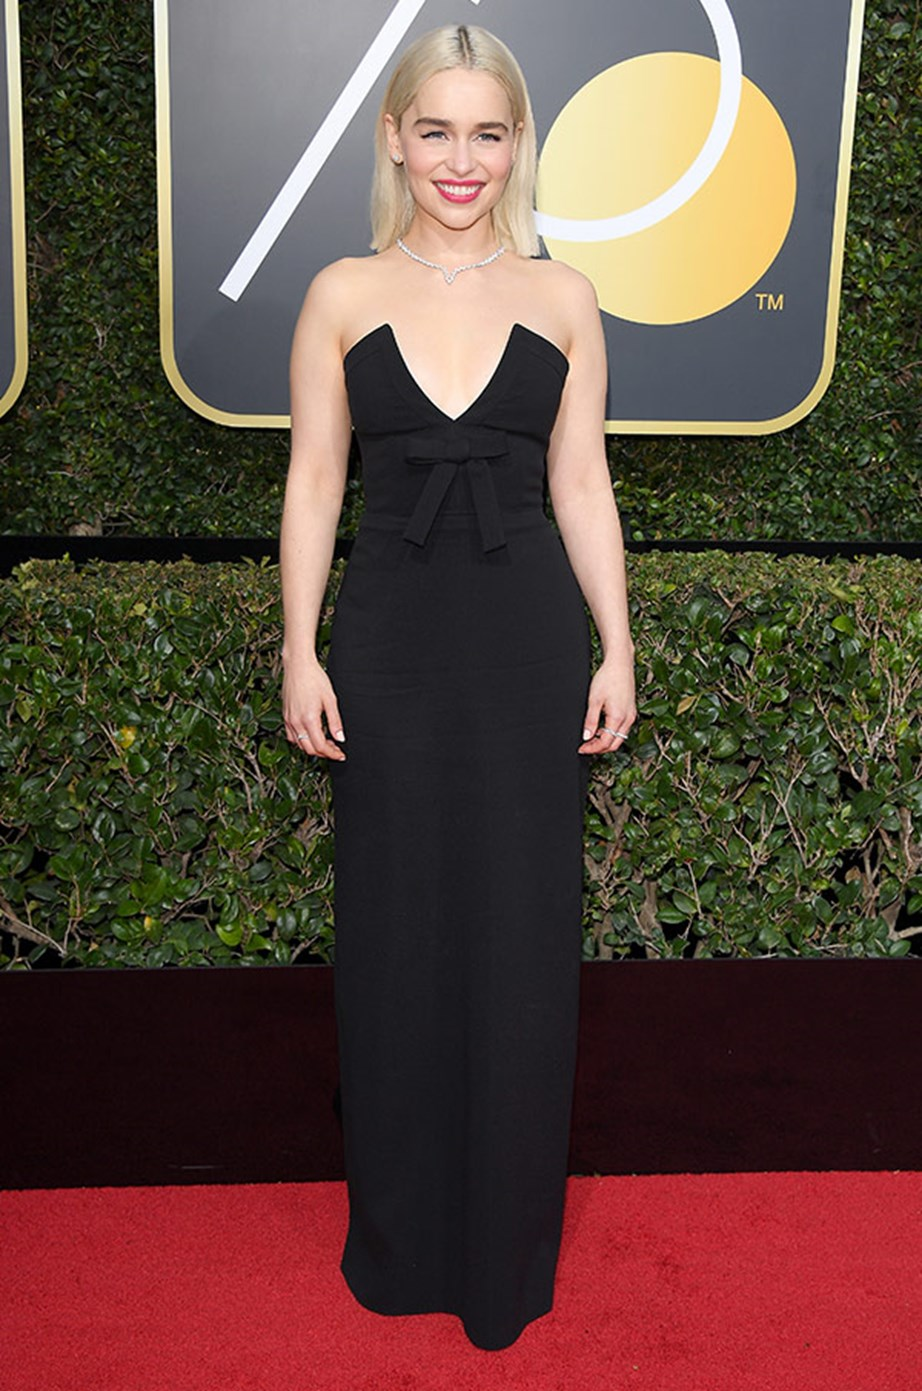 Mother of Dragons, it's Emilia Clarke.